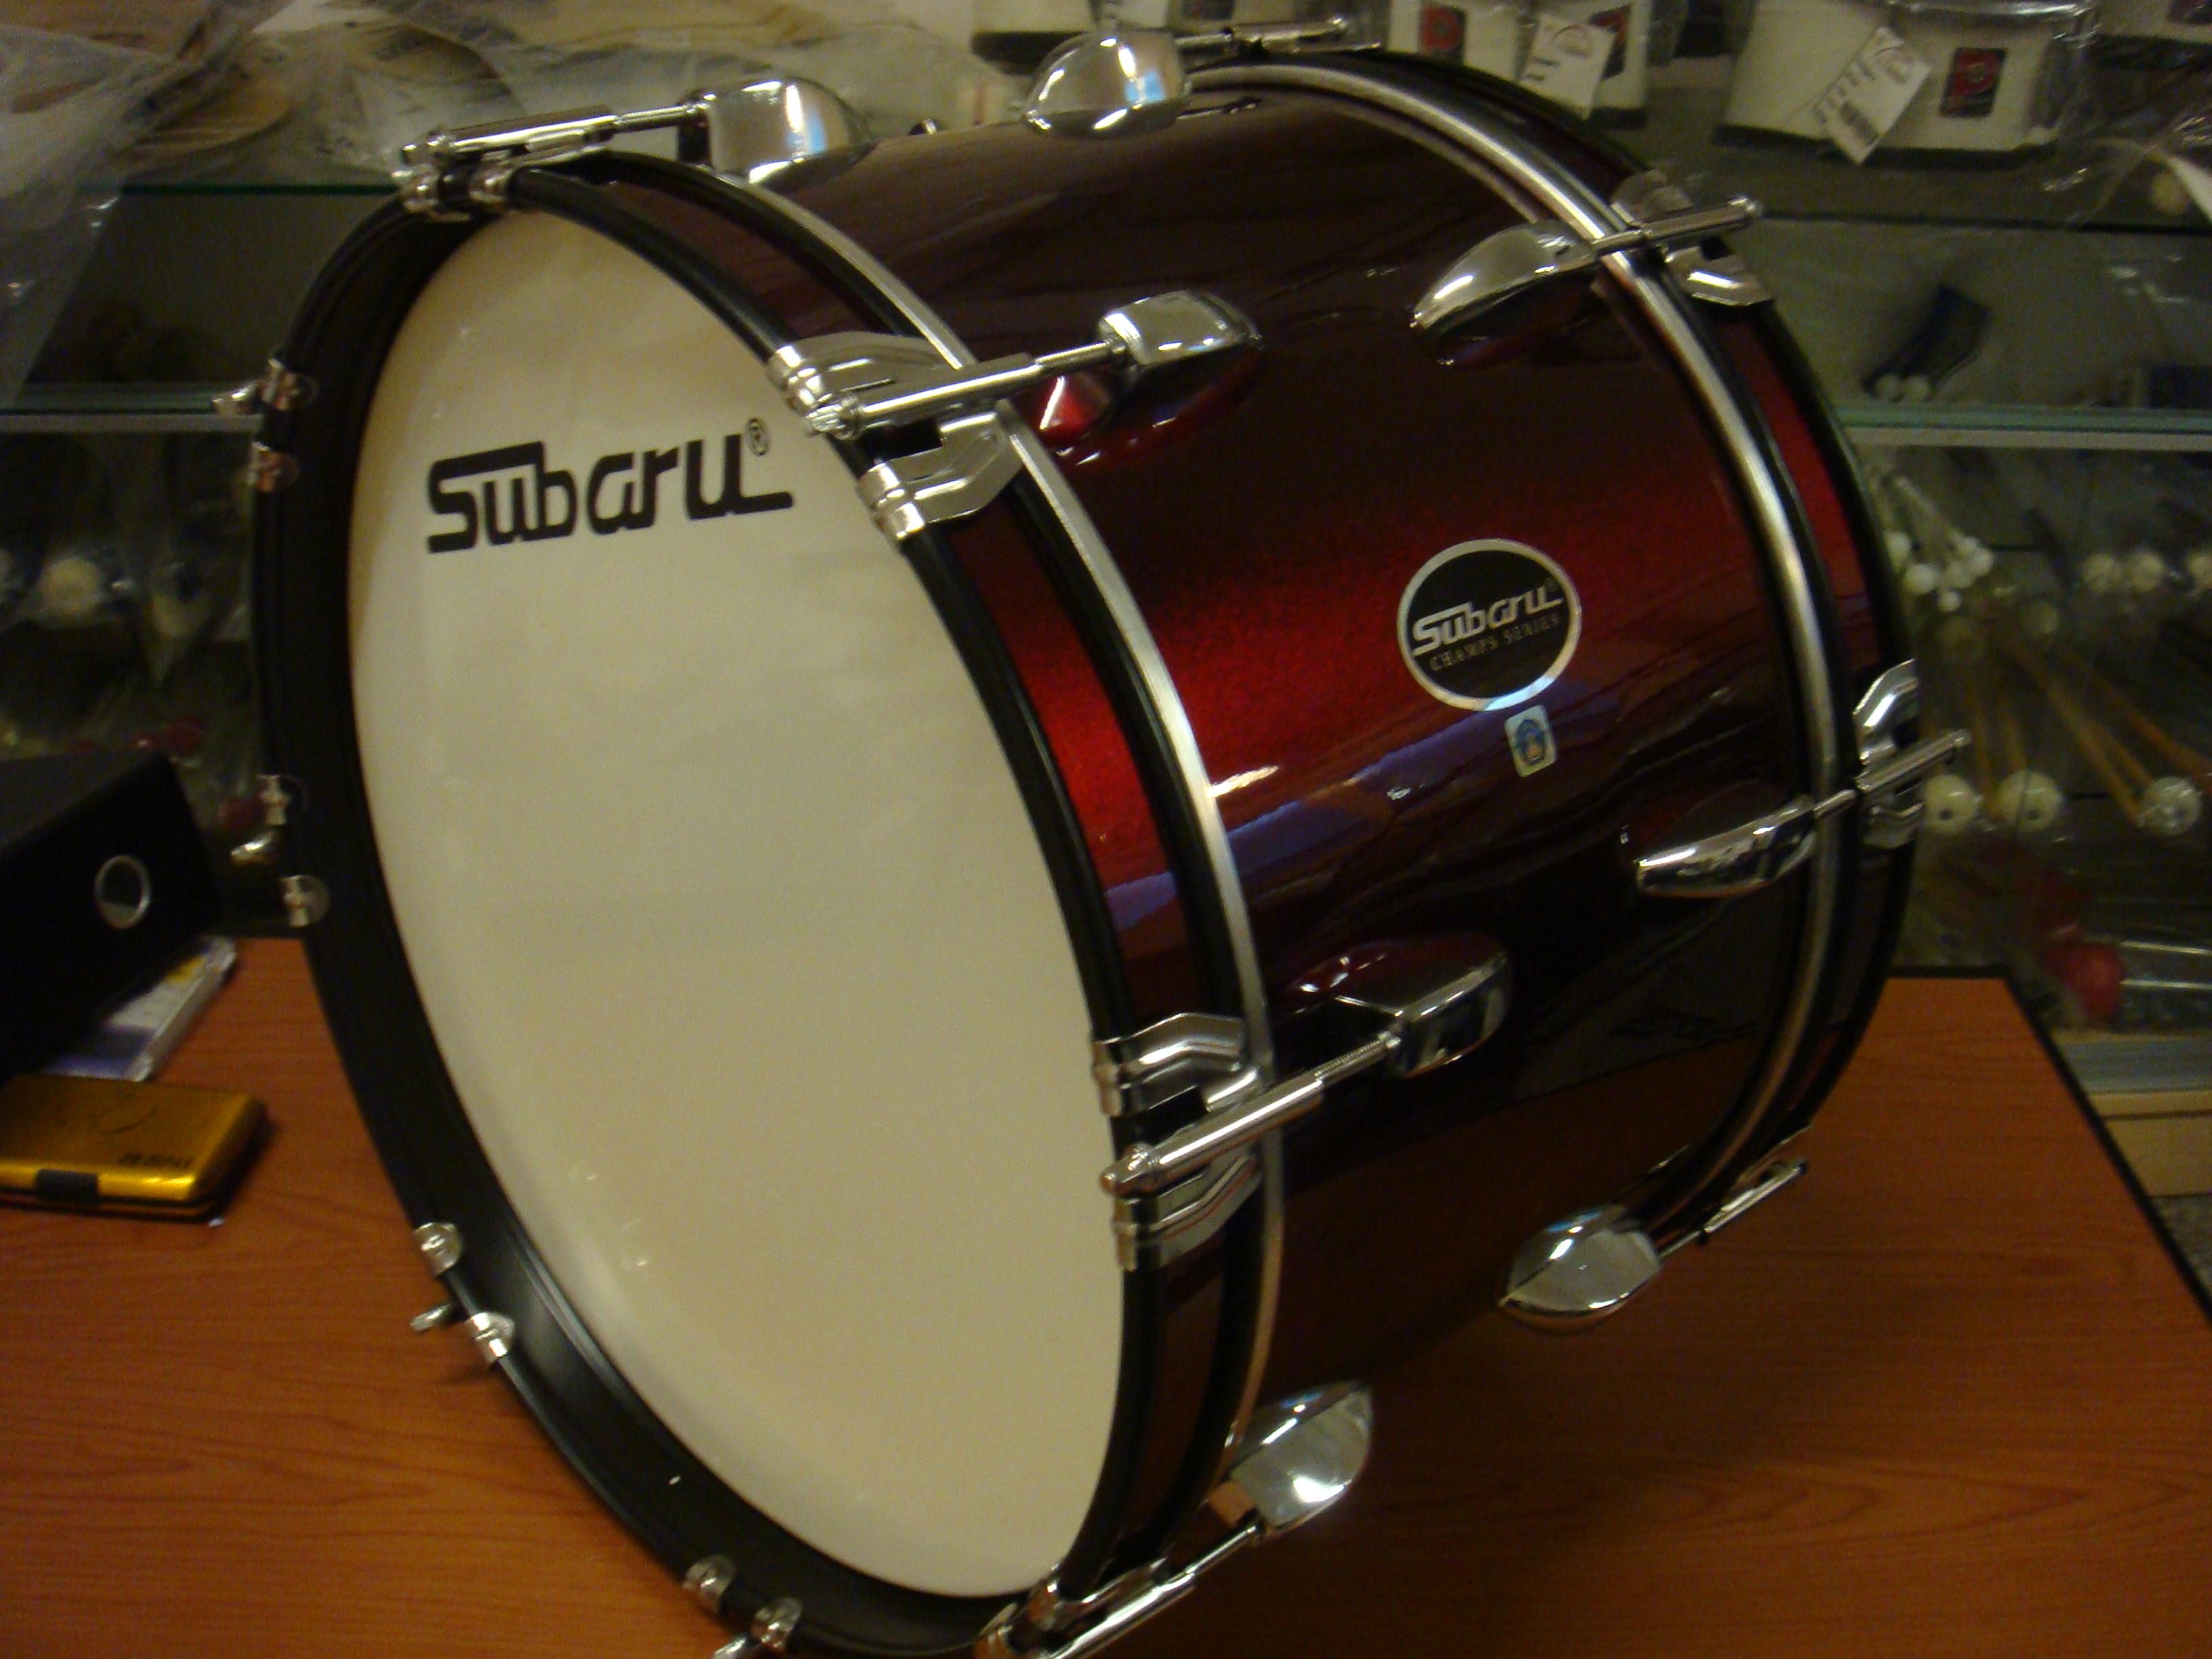 snare drum 10x8 4lugs red with sling stick toko musik jakarta. Black Bedroom Furniture Sets. Home Design Ideas